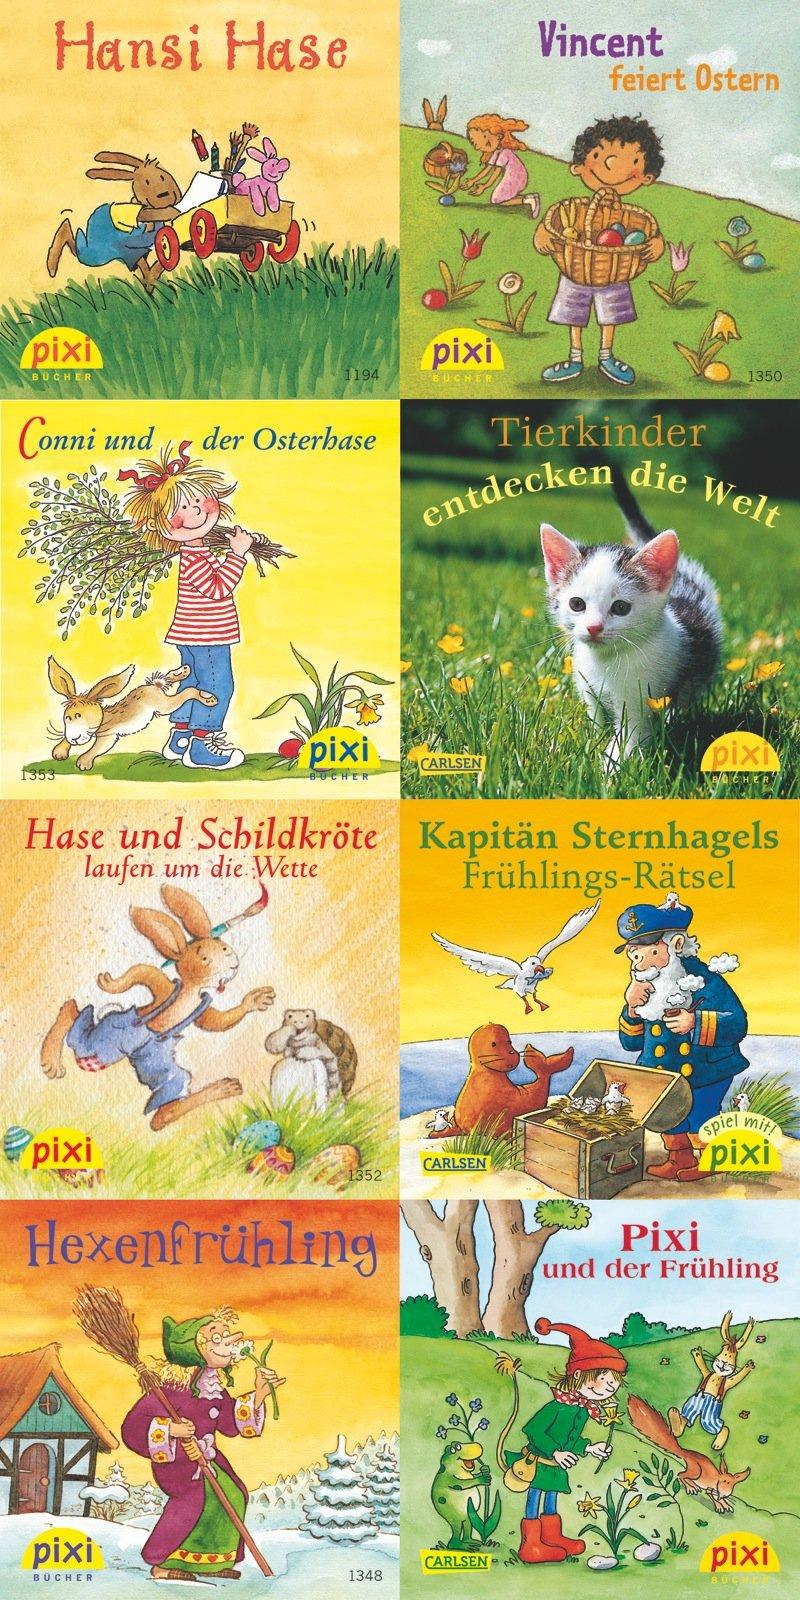 Pixi-Bundle 8er Serie 151: Frühling mit Pixi